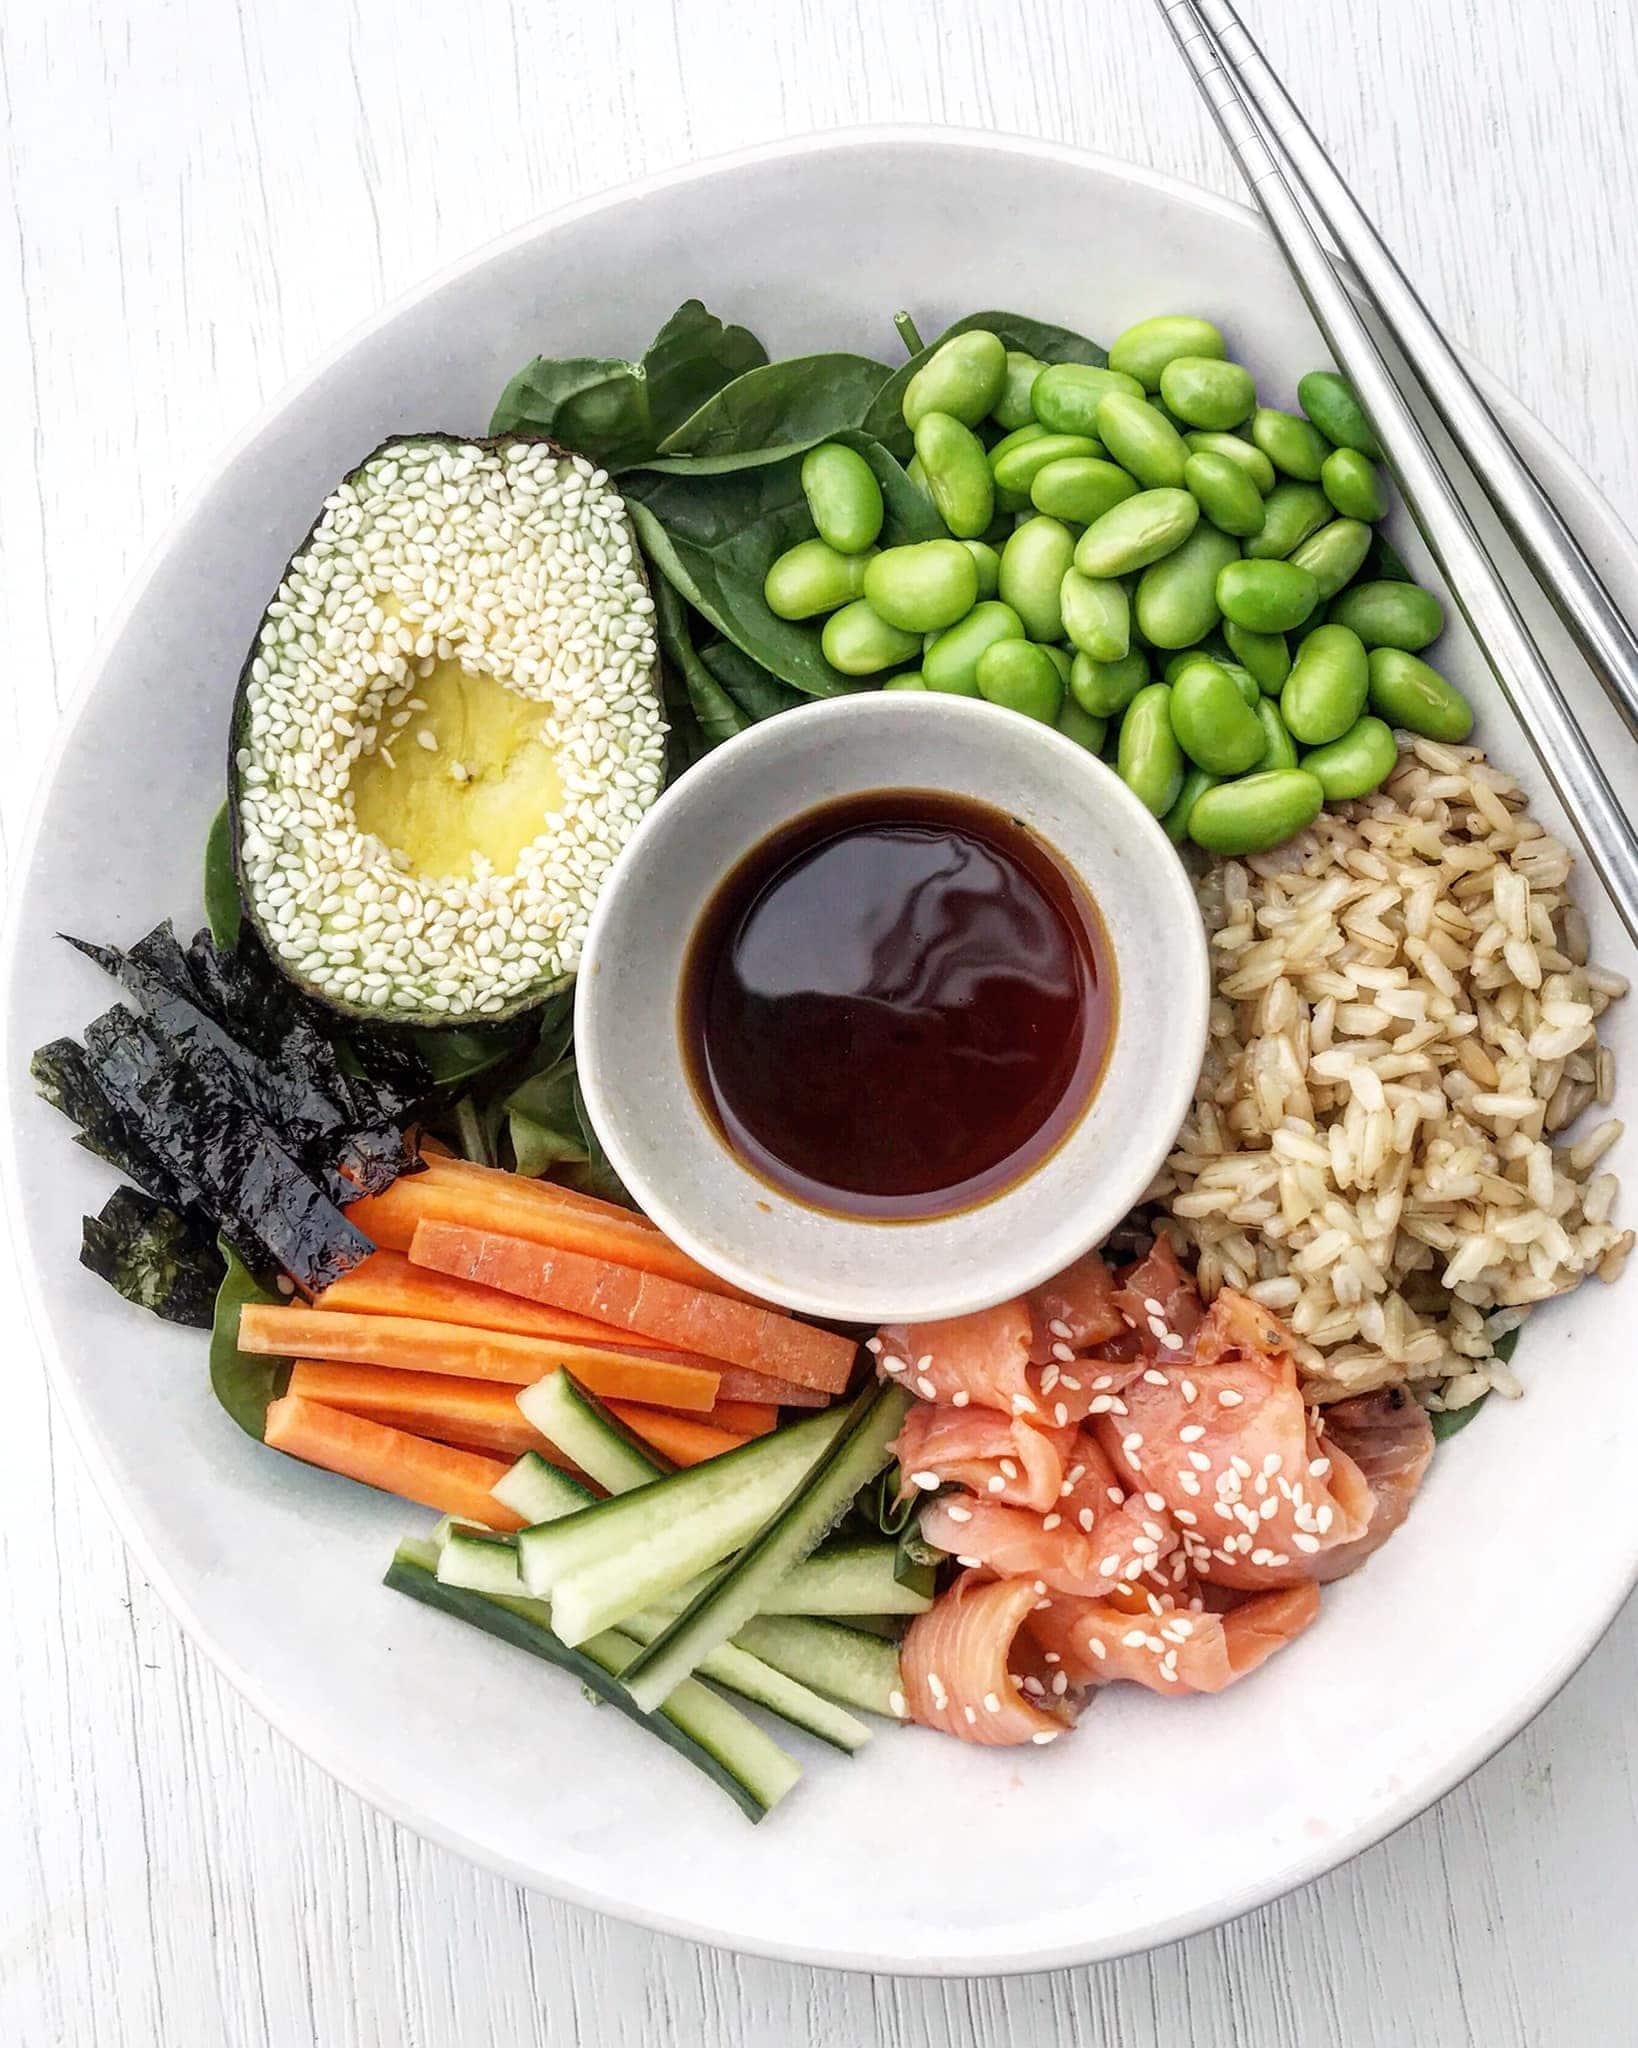 Sushi salad with salmon, edamame and avocado.